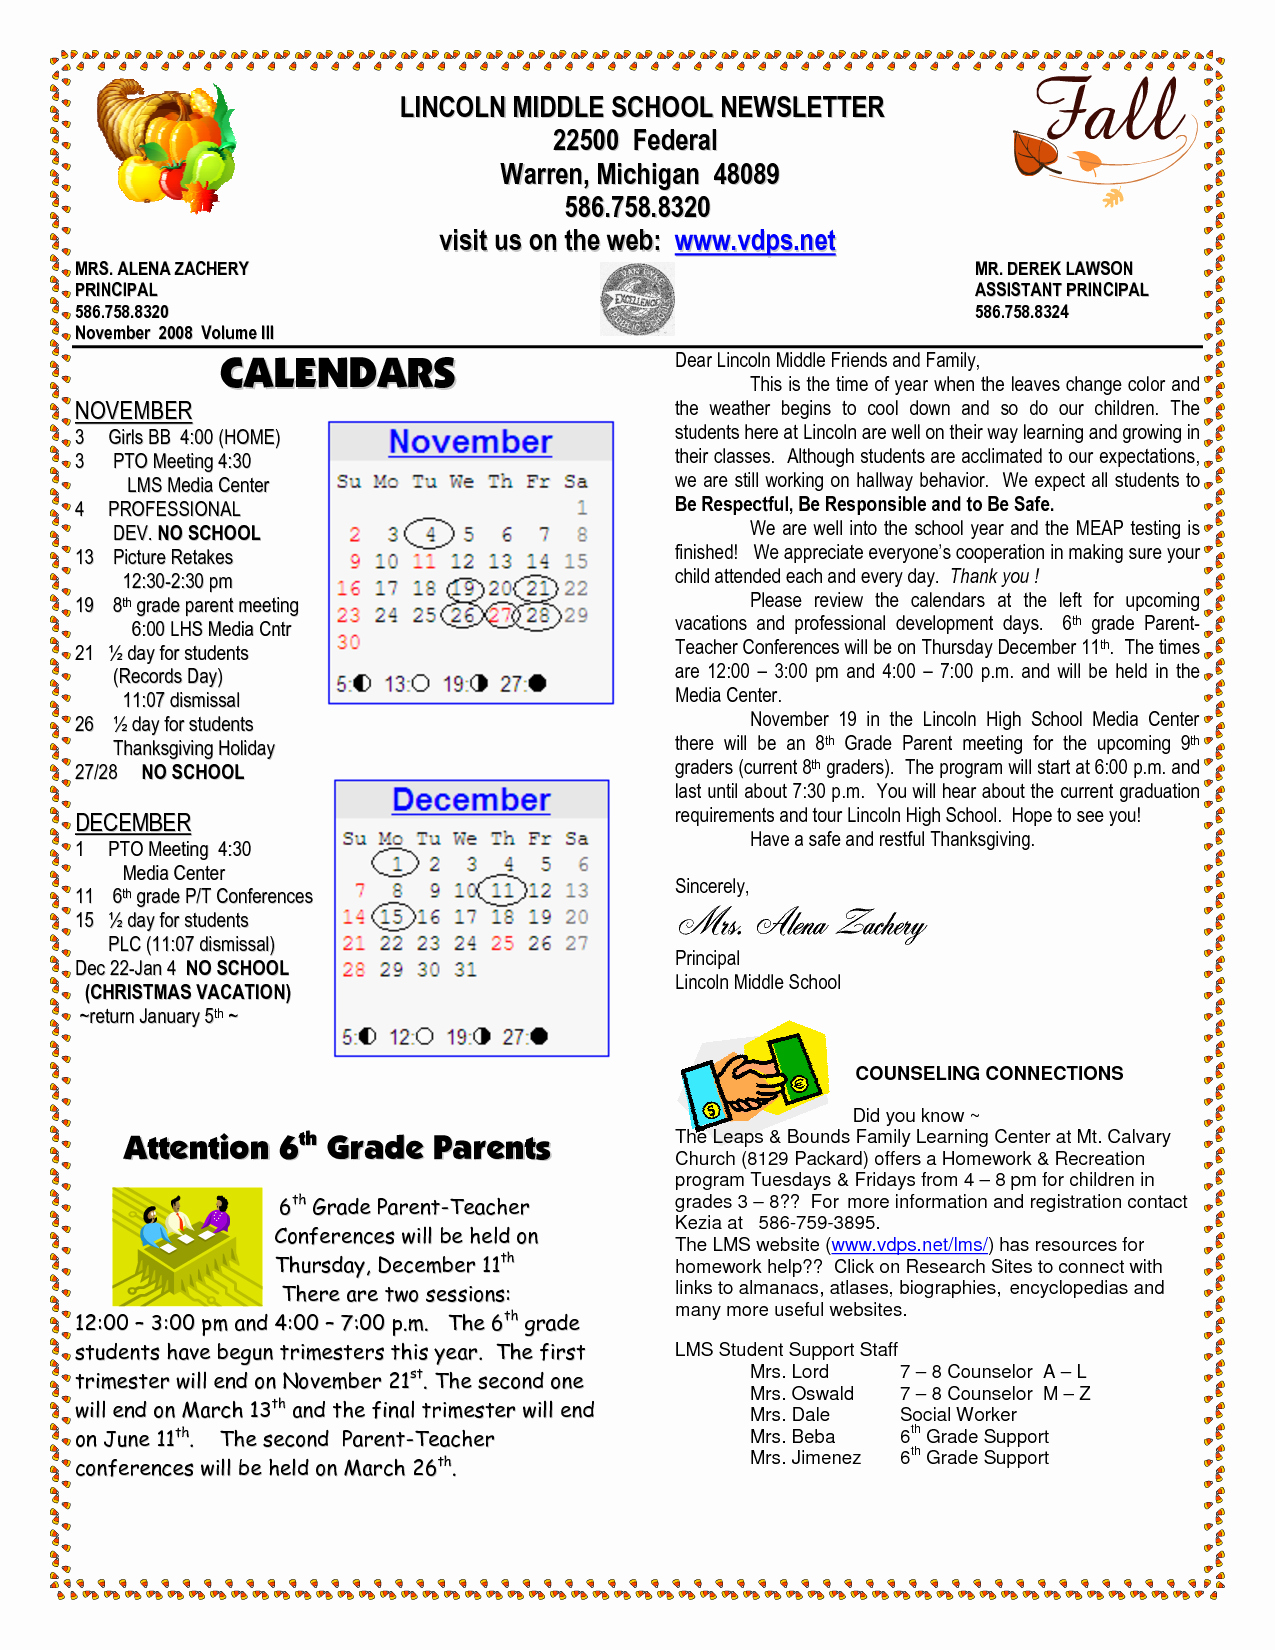 Elementary Classroom Newsletter Template Lovely School Newsletter Templates